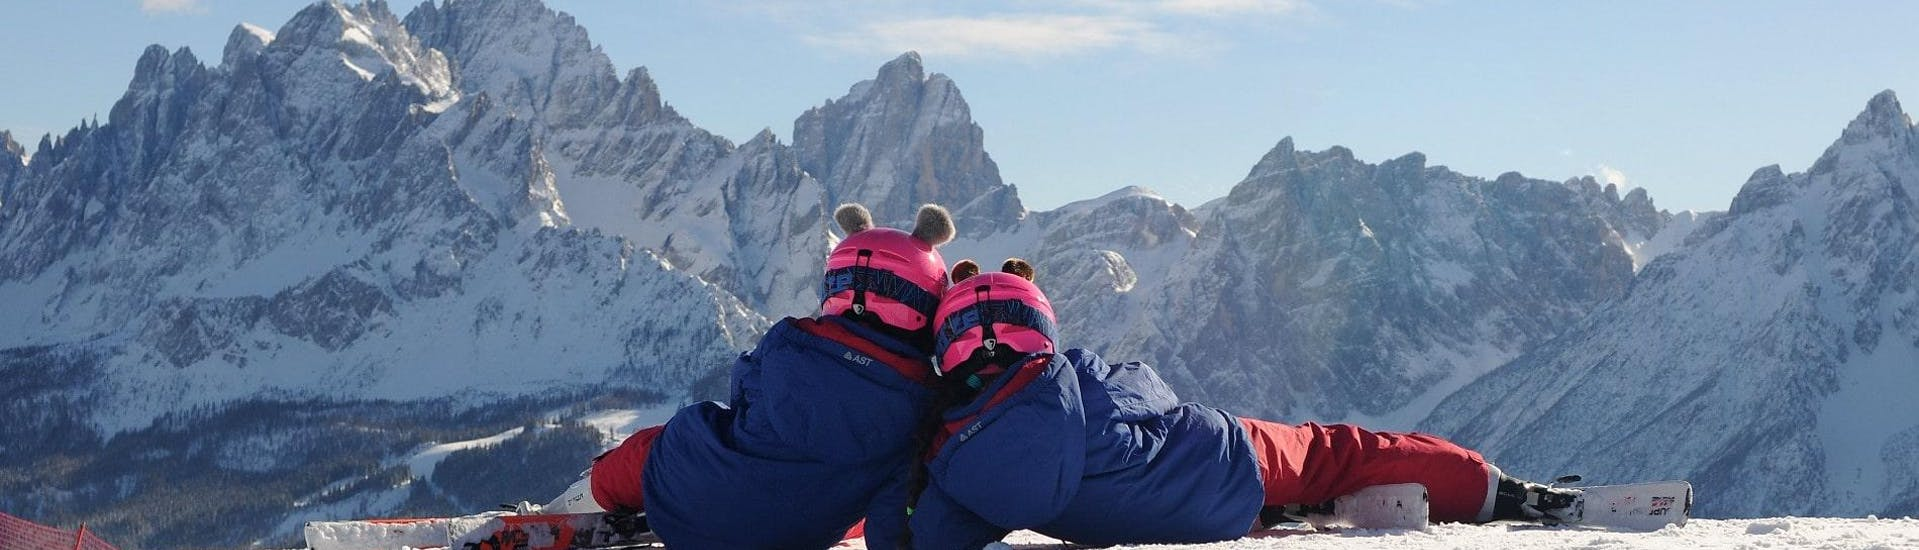 Curso de esquí para niños para debutantes